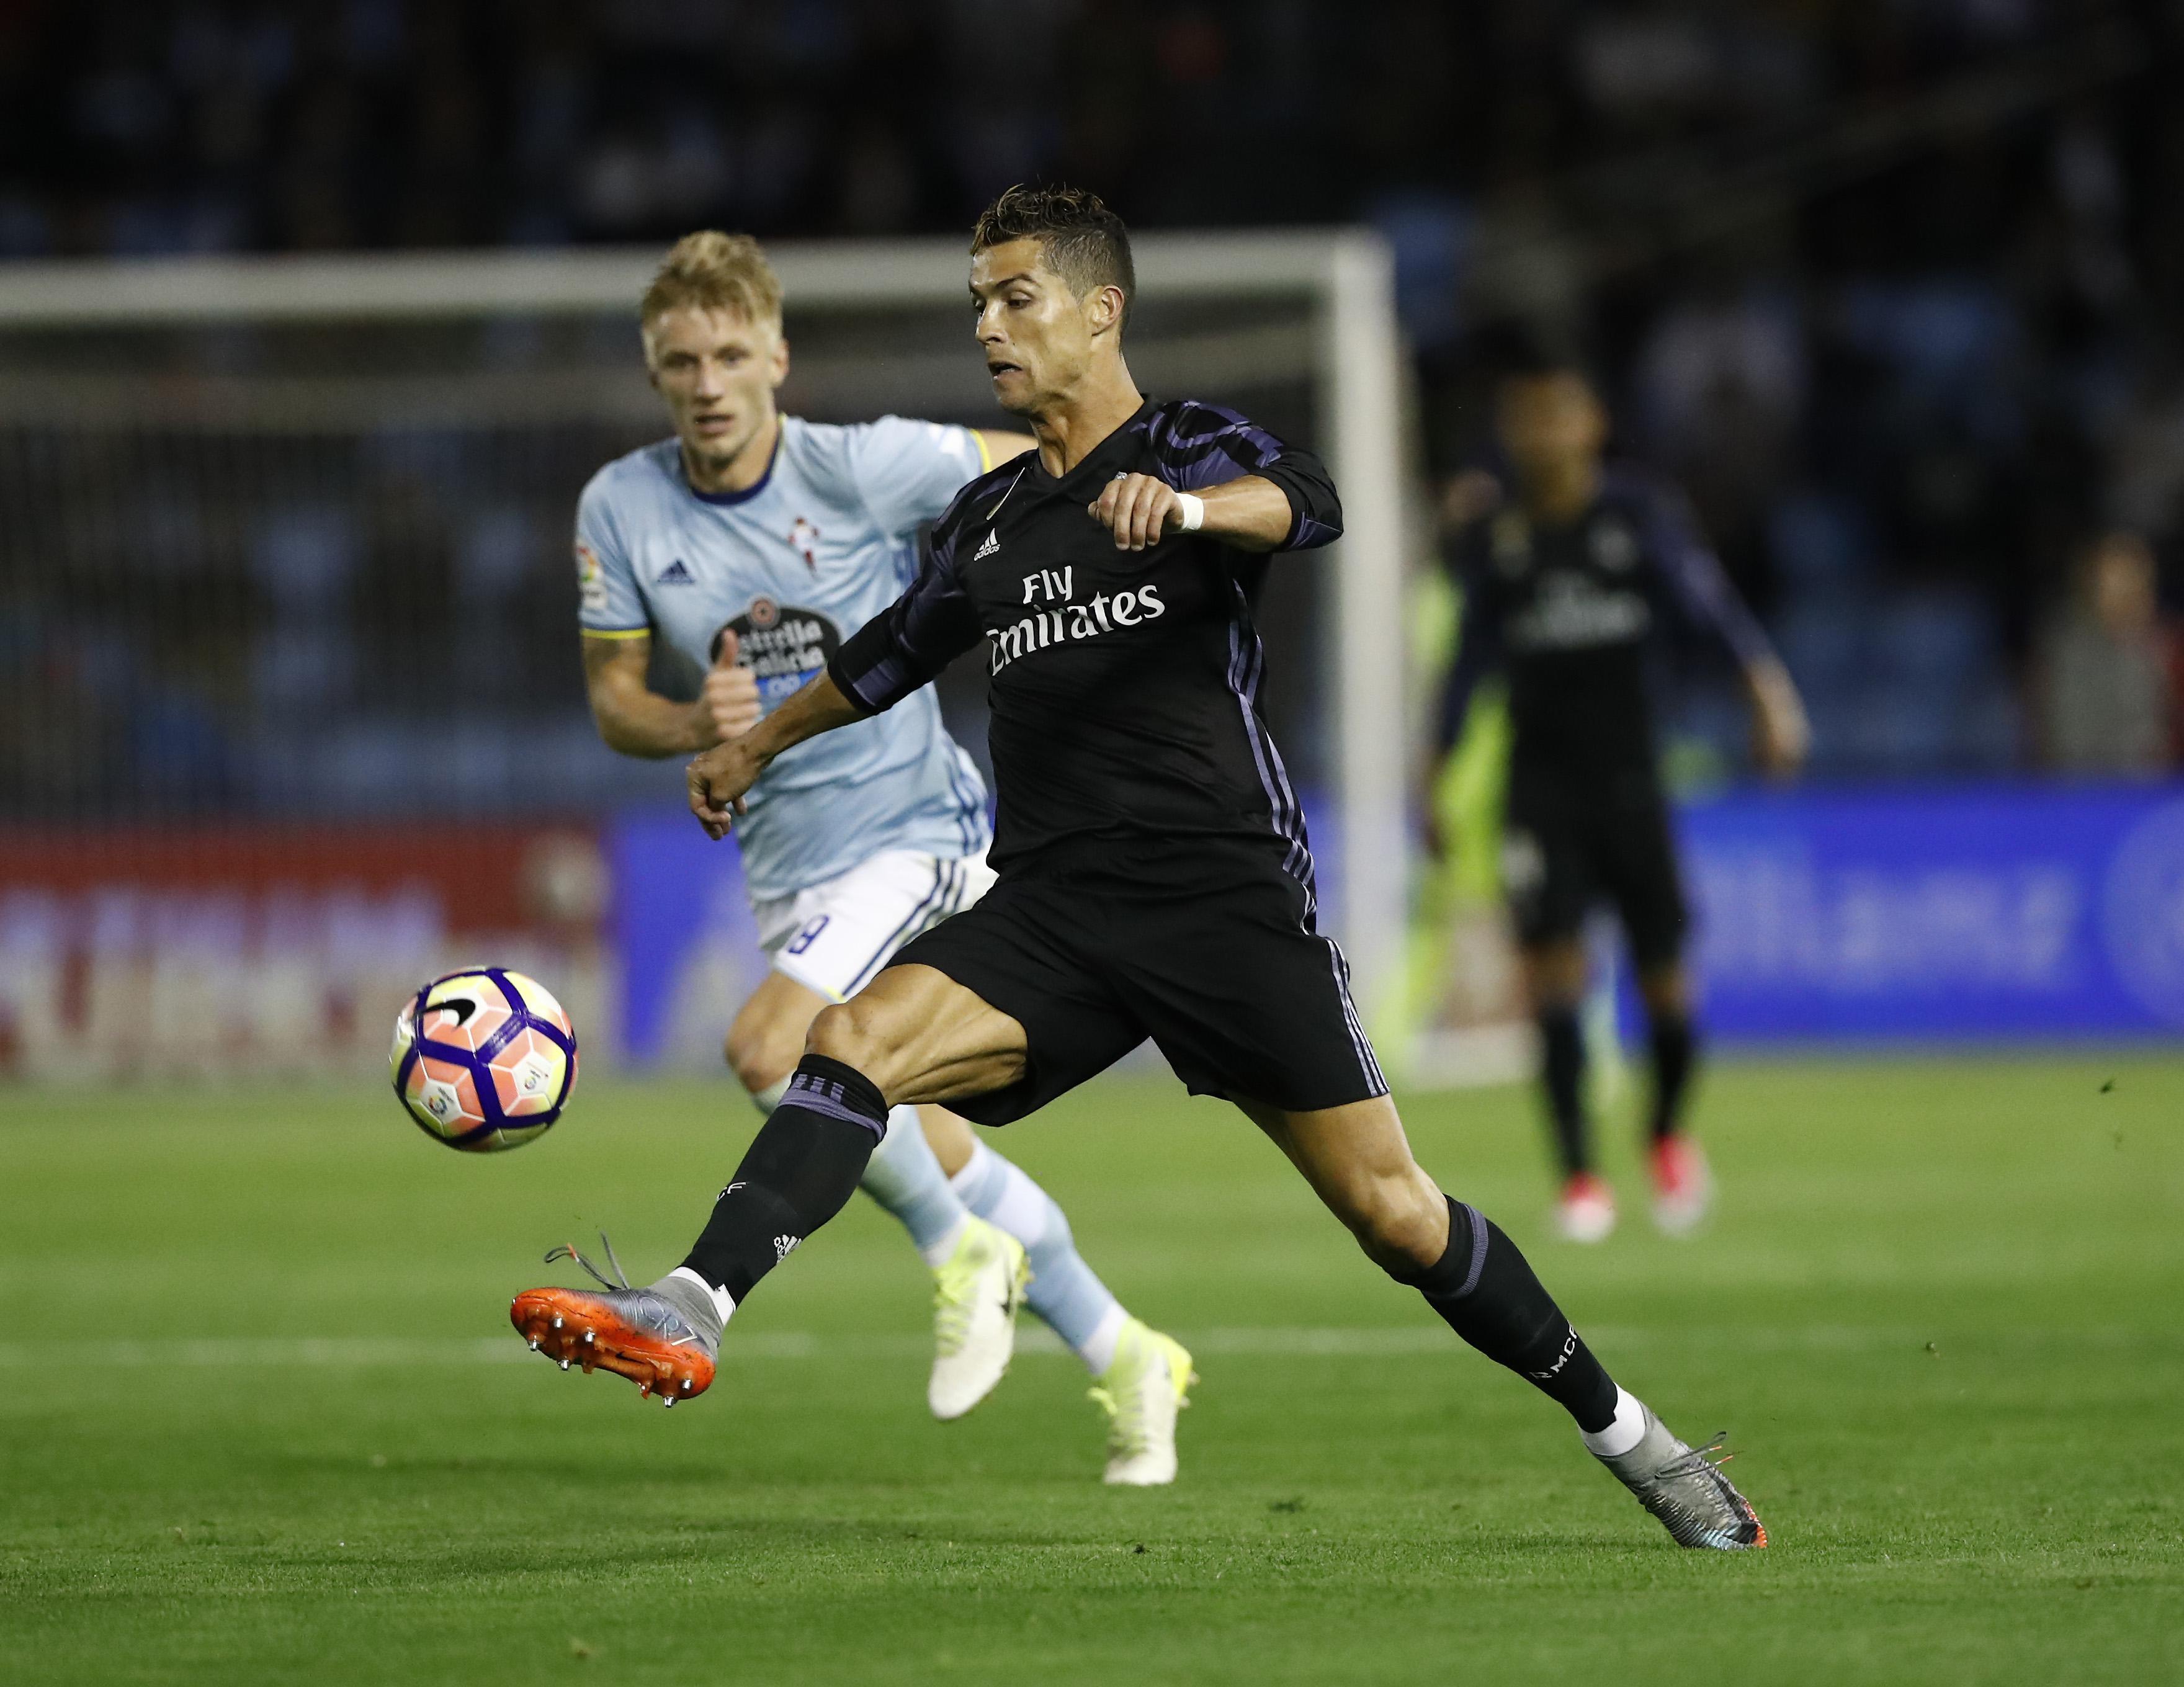 Ronaldo scored 39 goals last season – many scored by his so called weaker foot